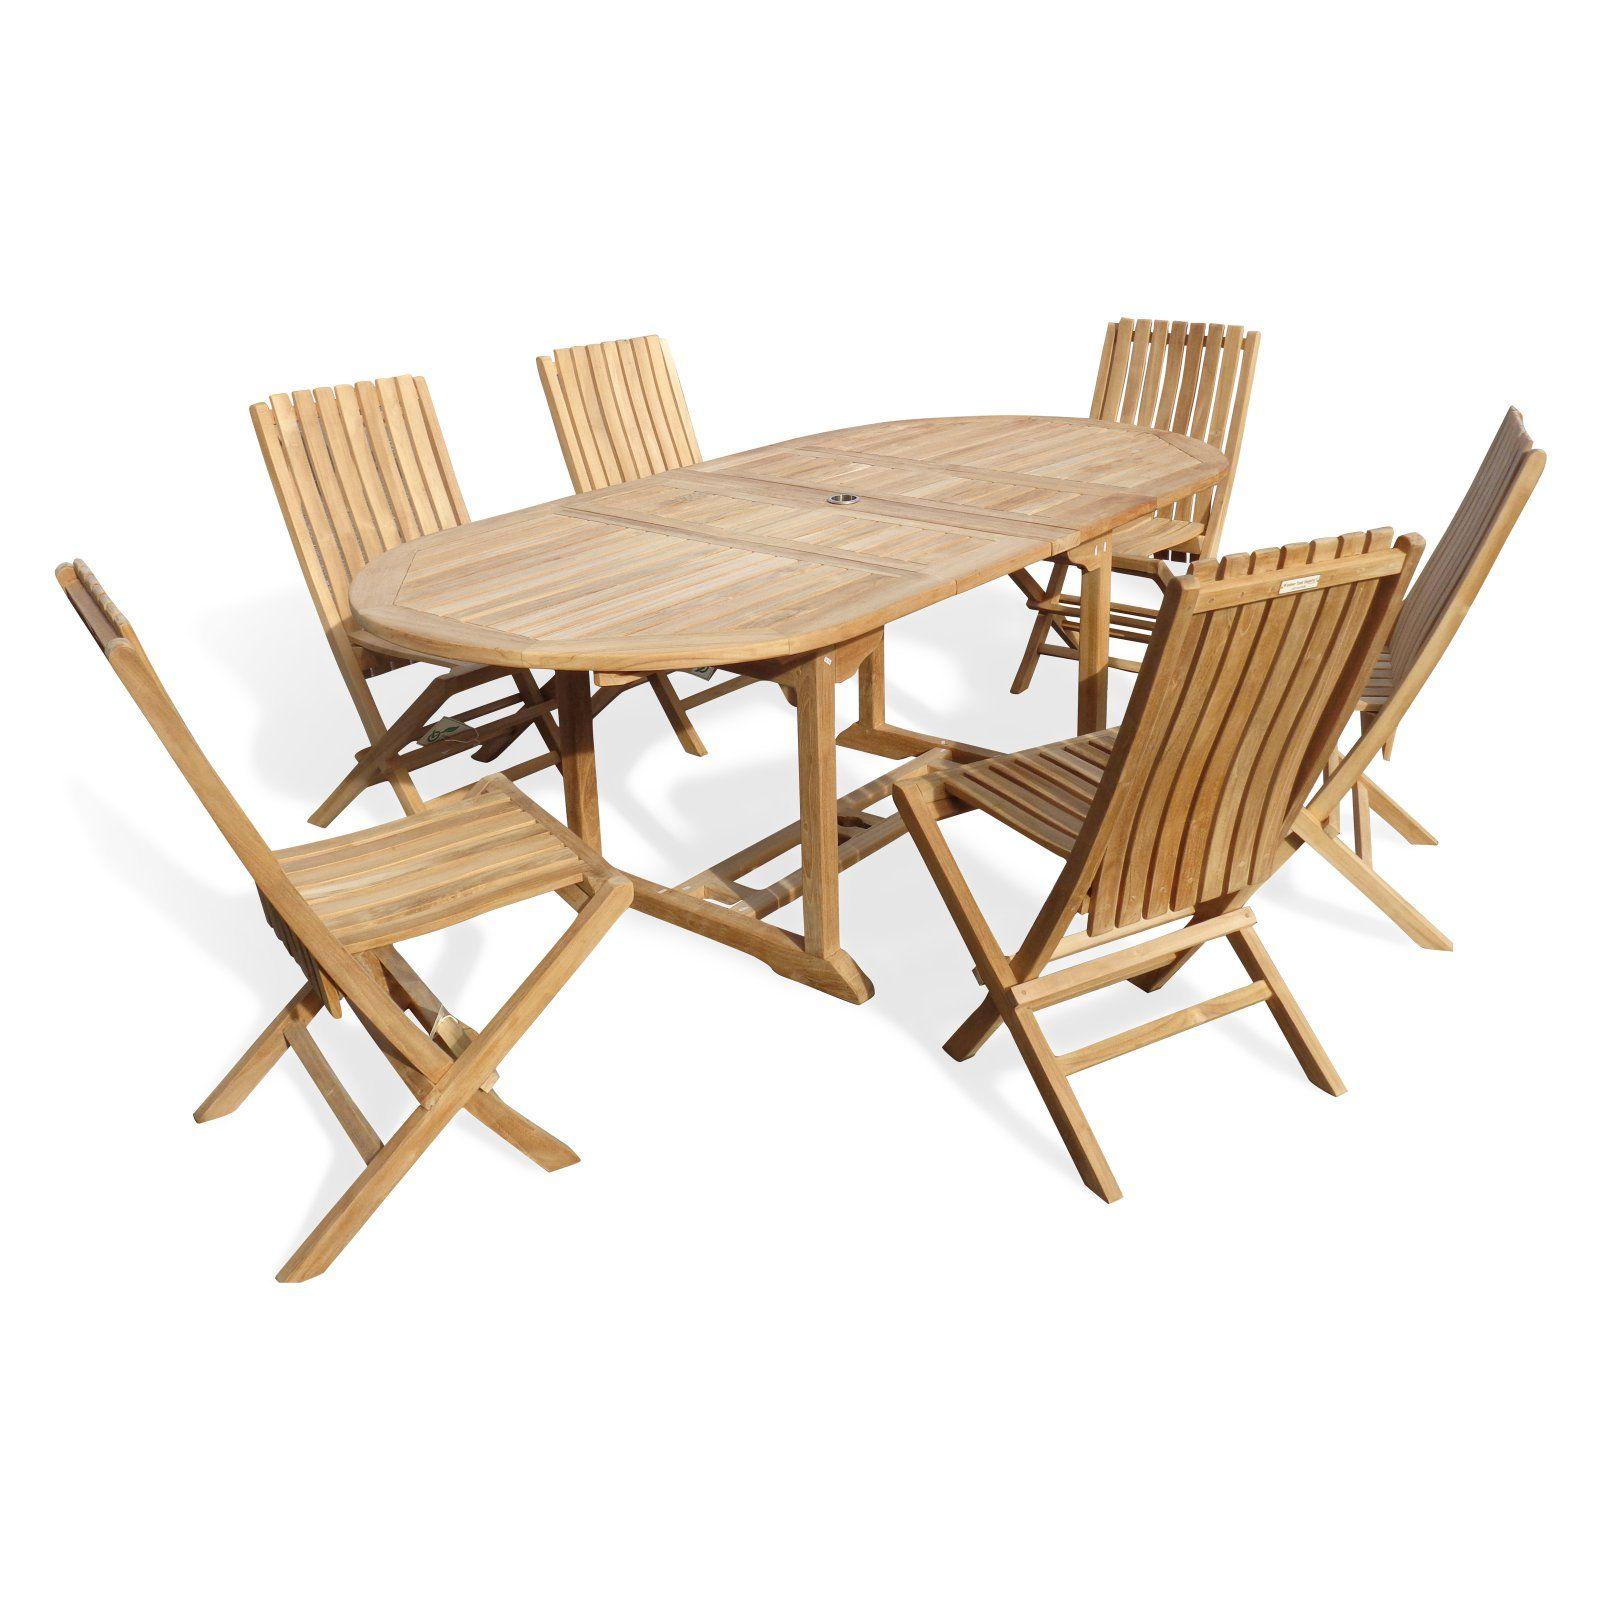 Outdoor Windsor Teak Furniture Buckingham Teak Double Leaf 7 Piece